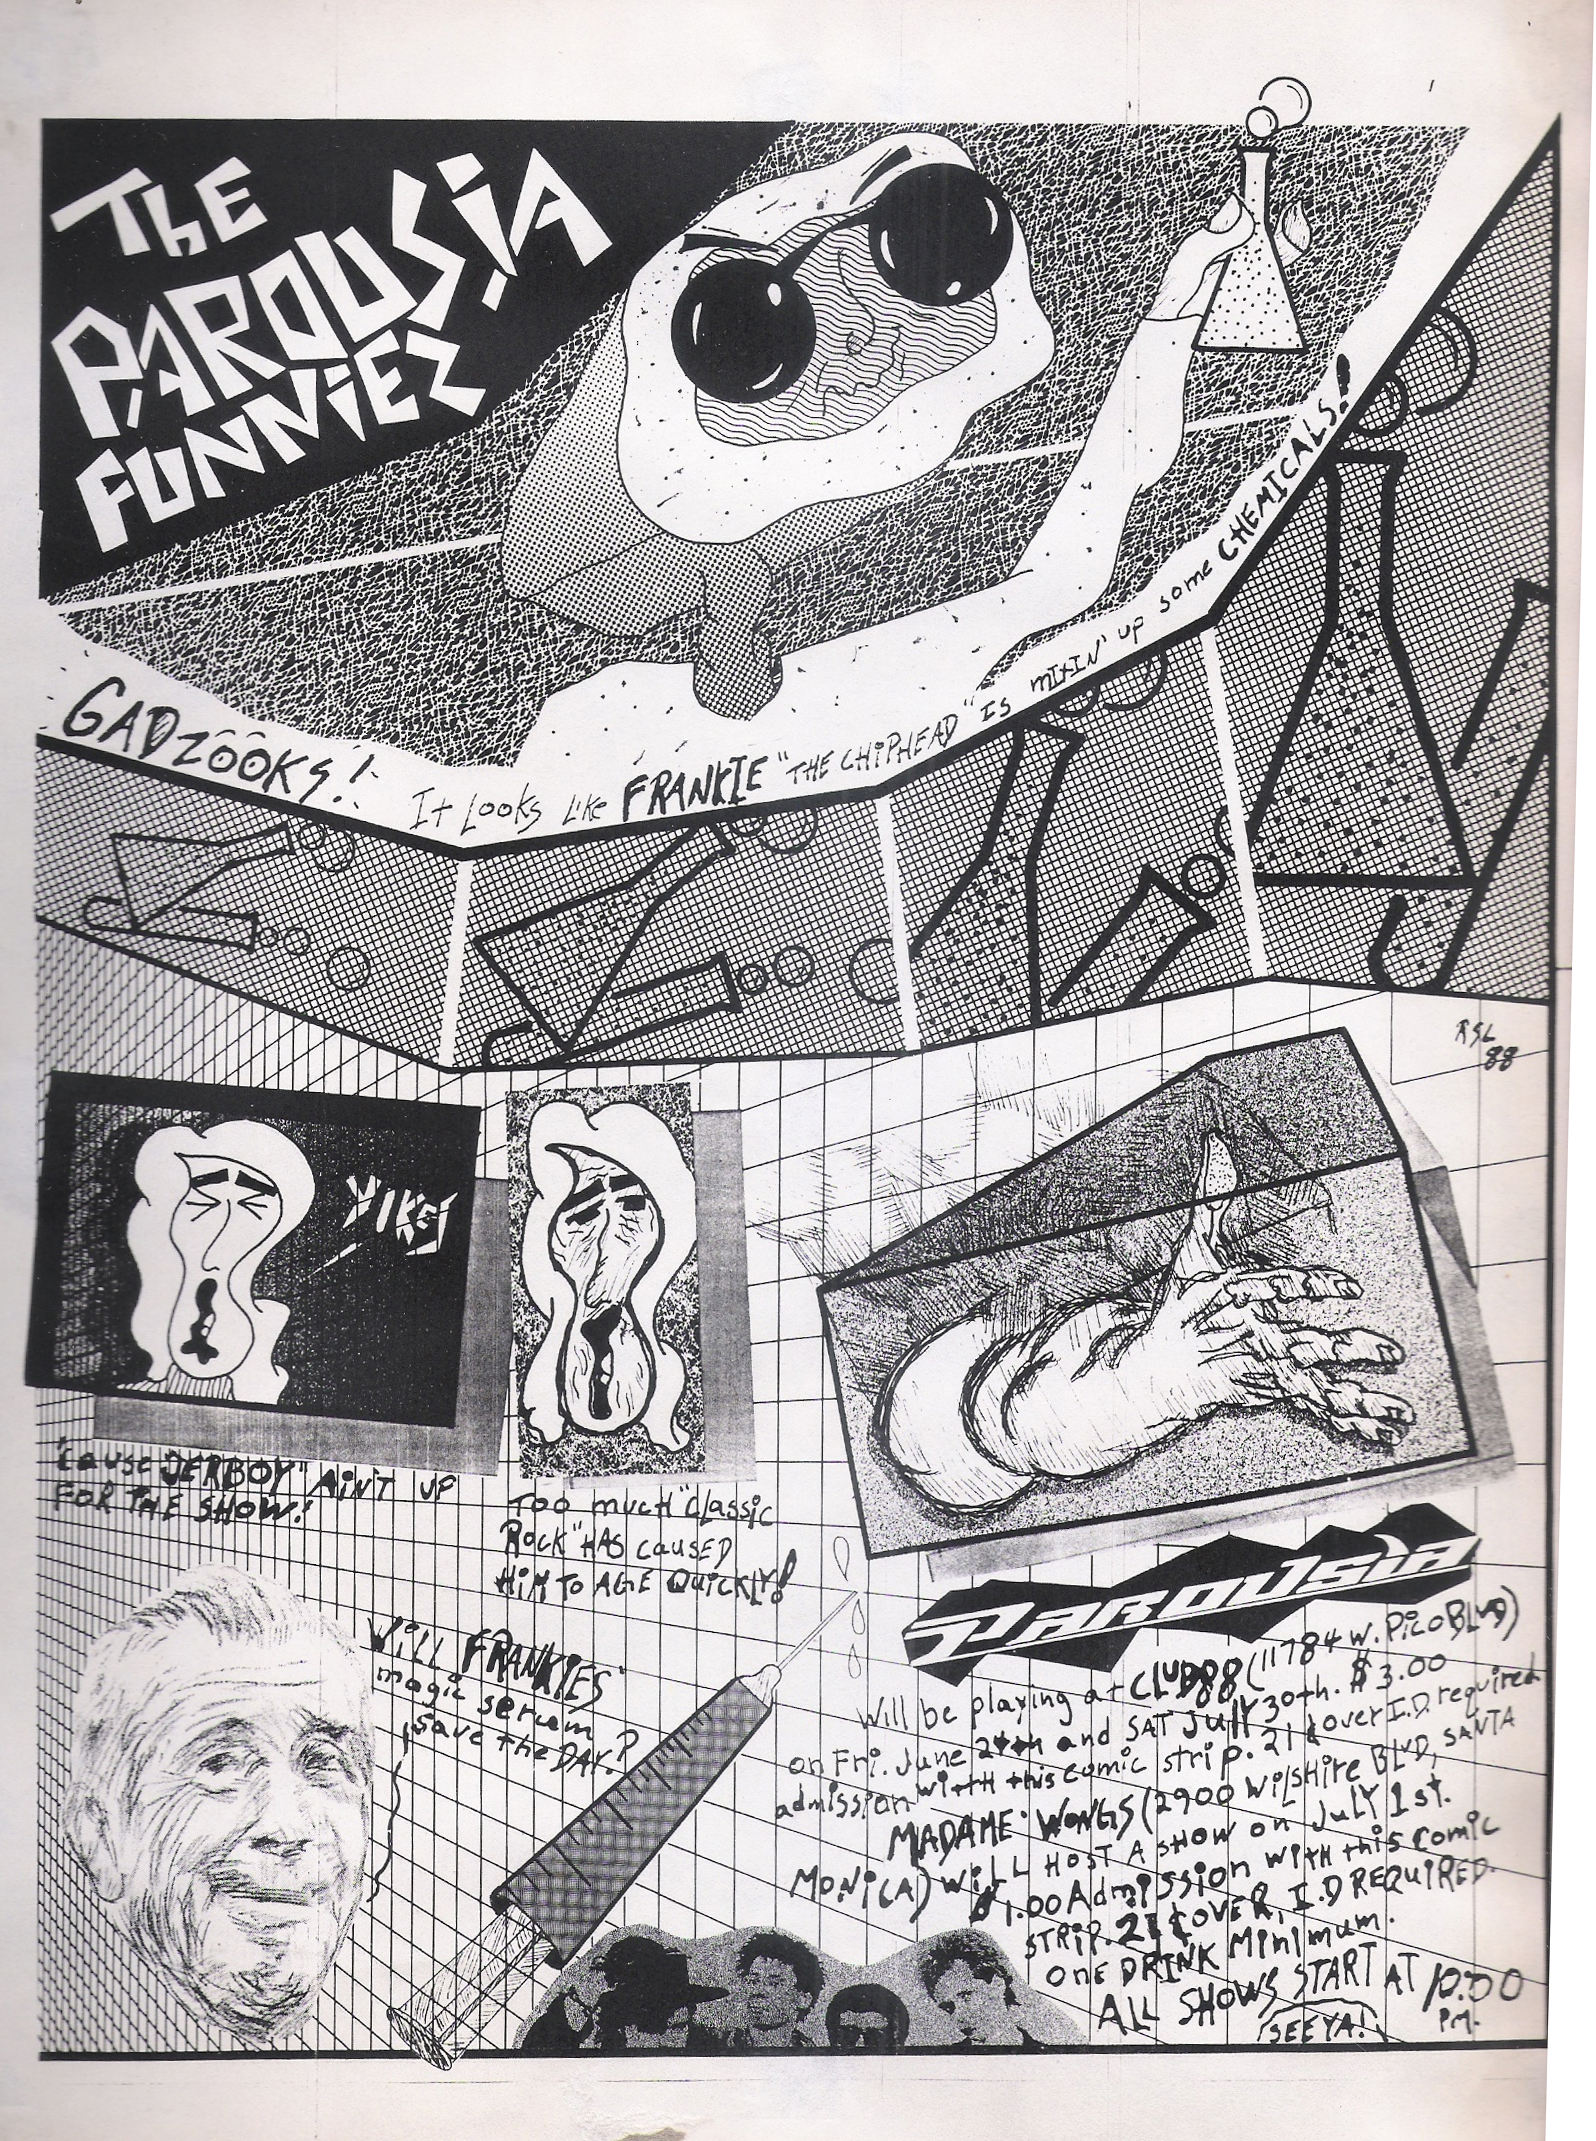 Parousia cartoon gig flyer - Club 88, June 24, 1988